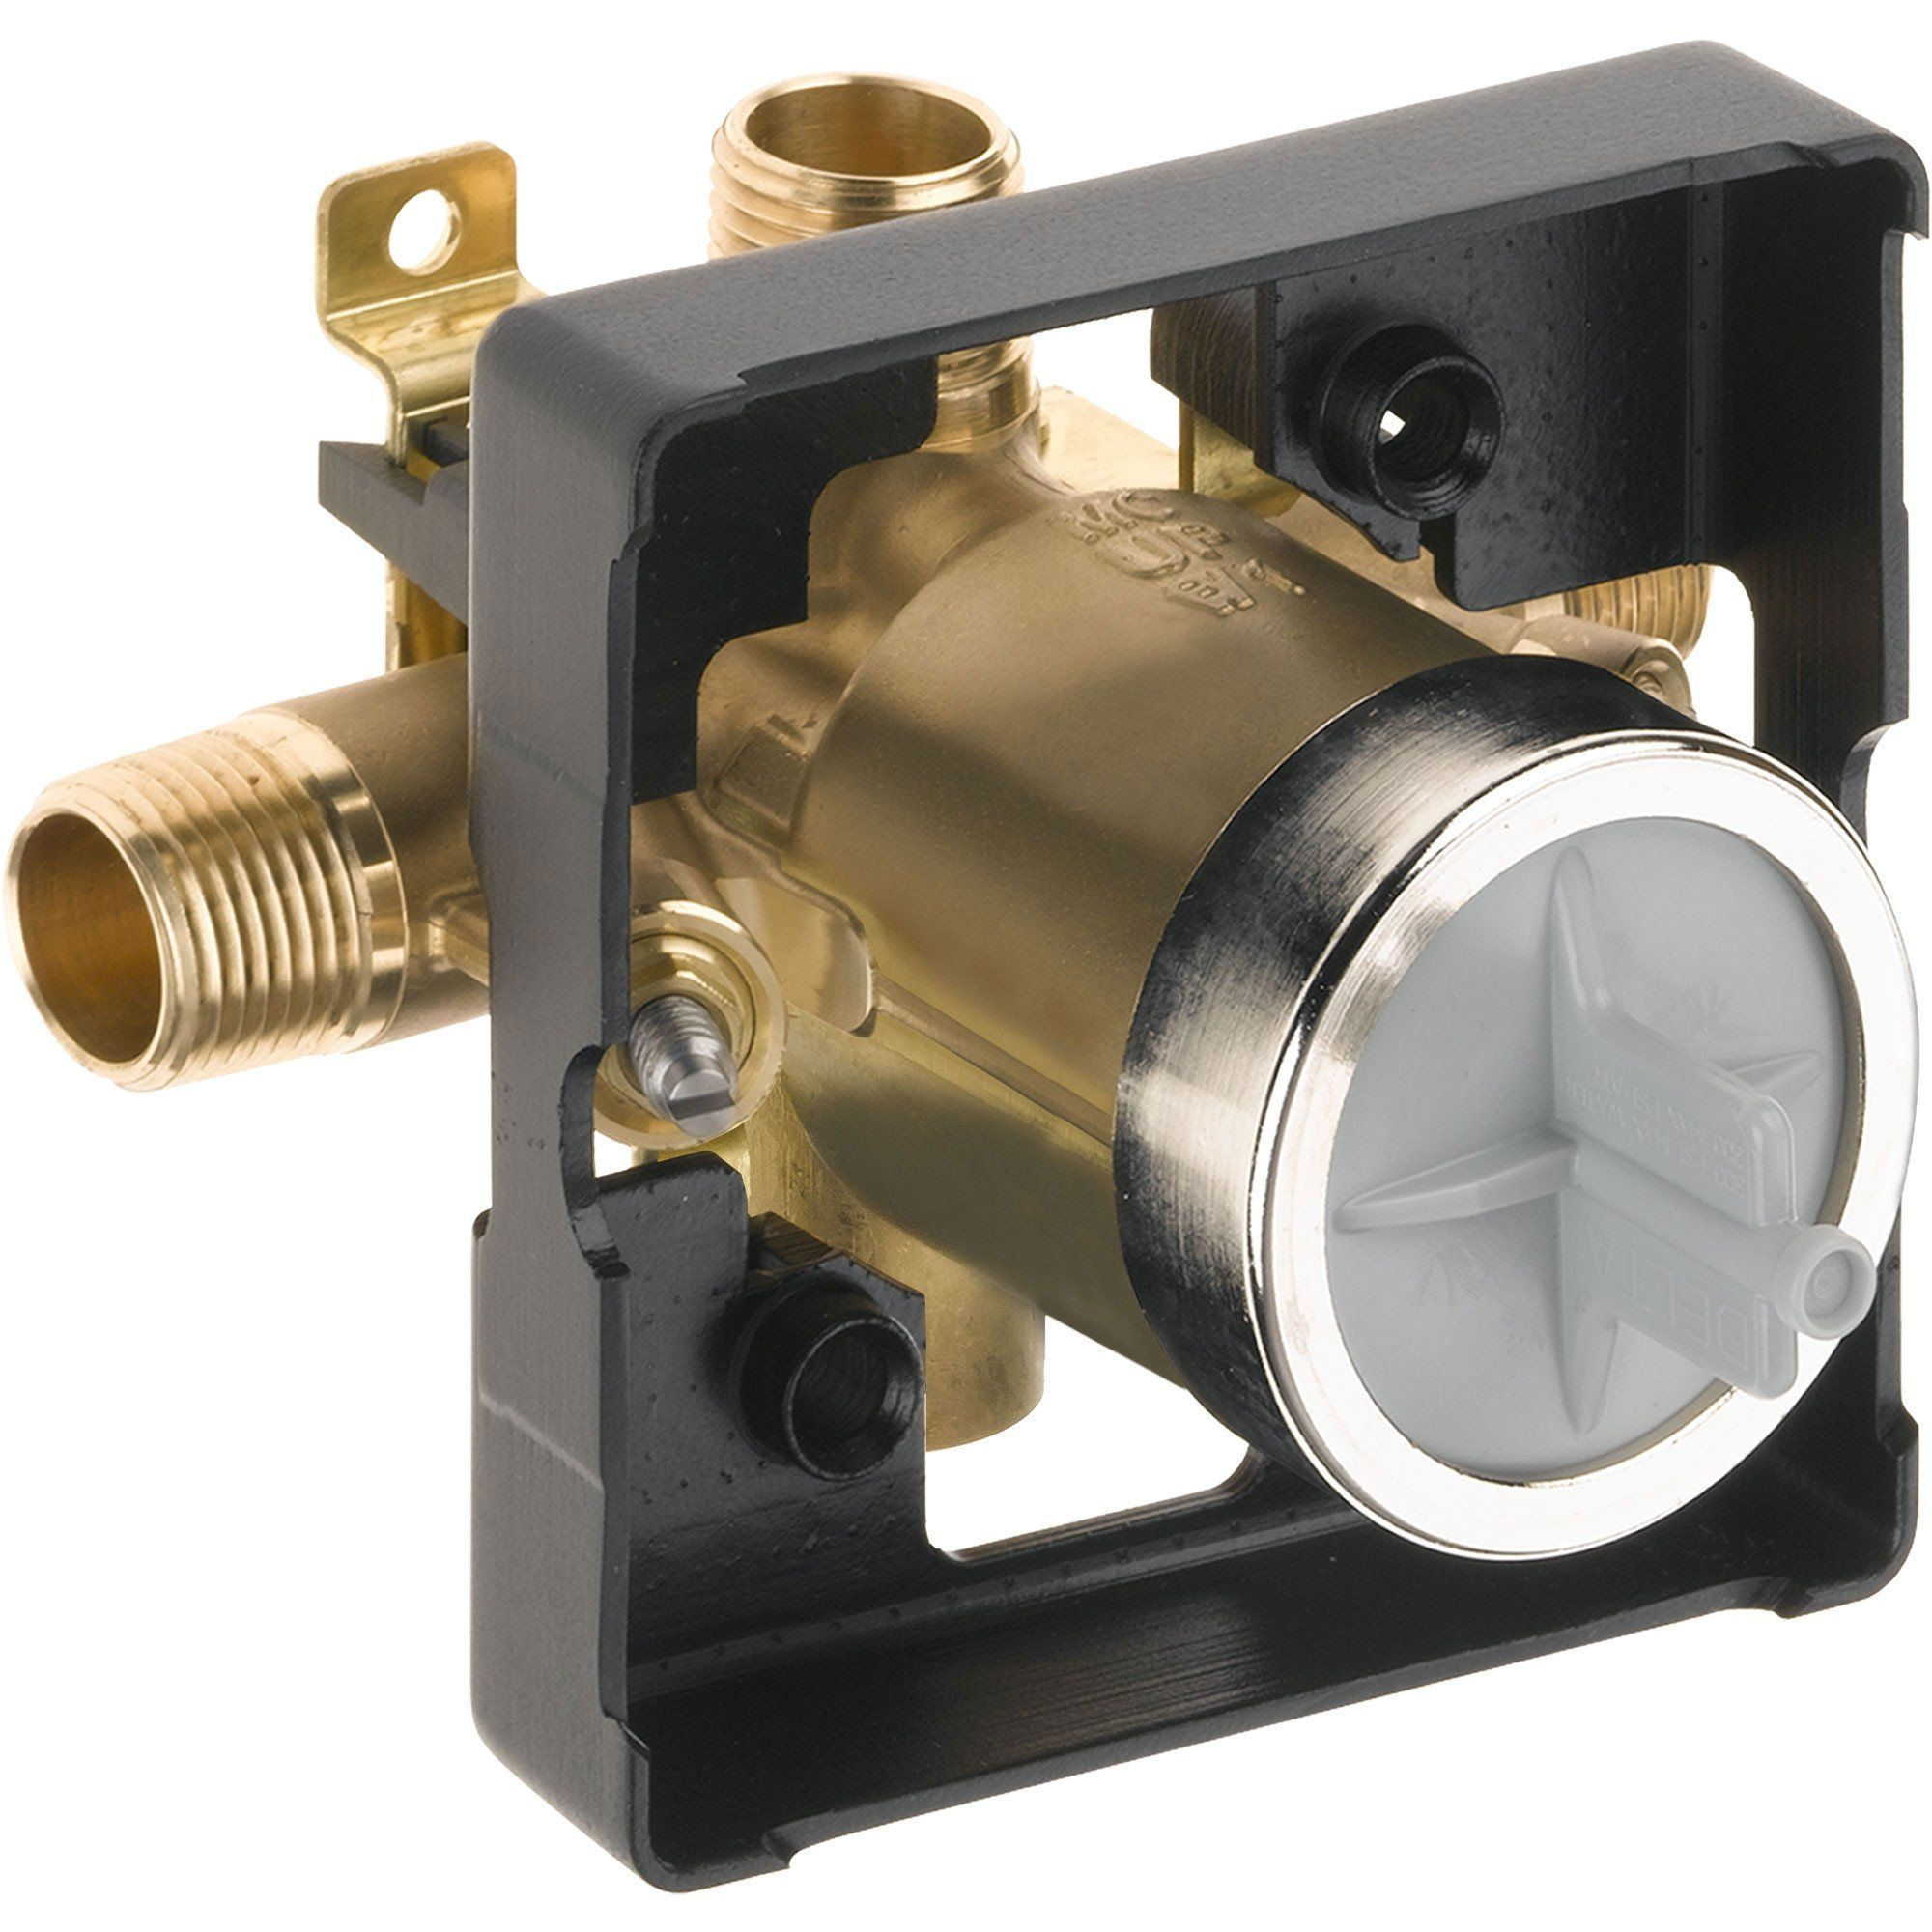 Delta Ashlyn 1 Handle Pressure Balance Shower Faucet Trim Kit In